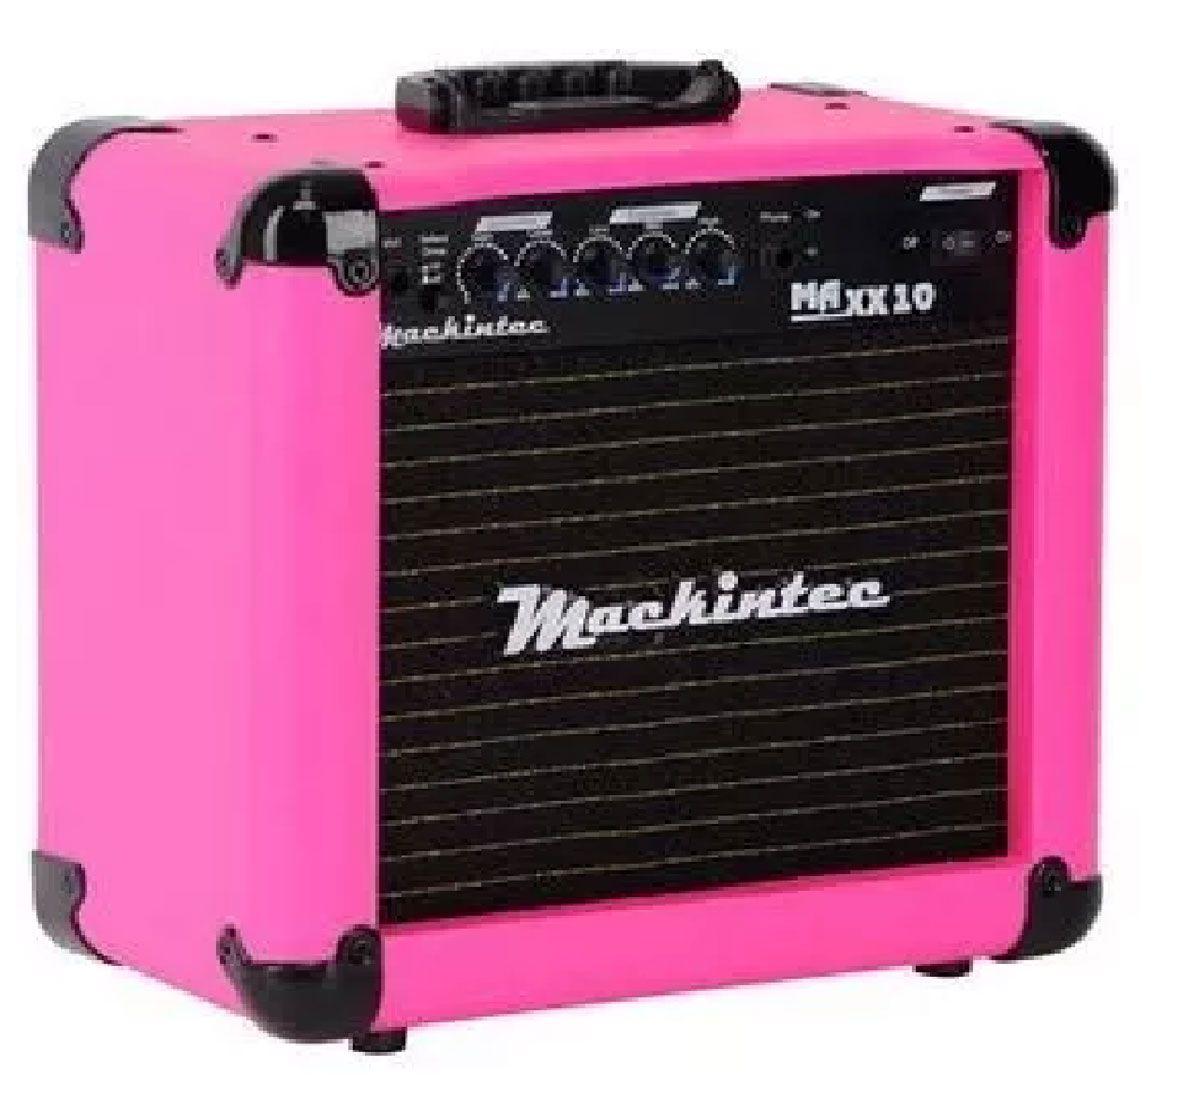 Caixa Amplificada Mackintec Maxx10 C/Distorção Guitarra 15wrms Rosa